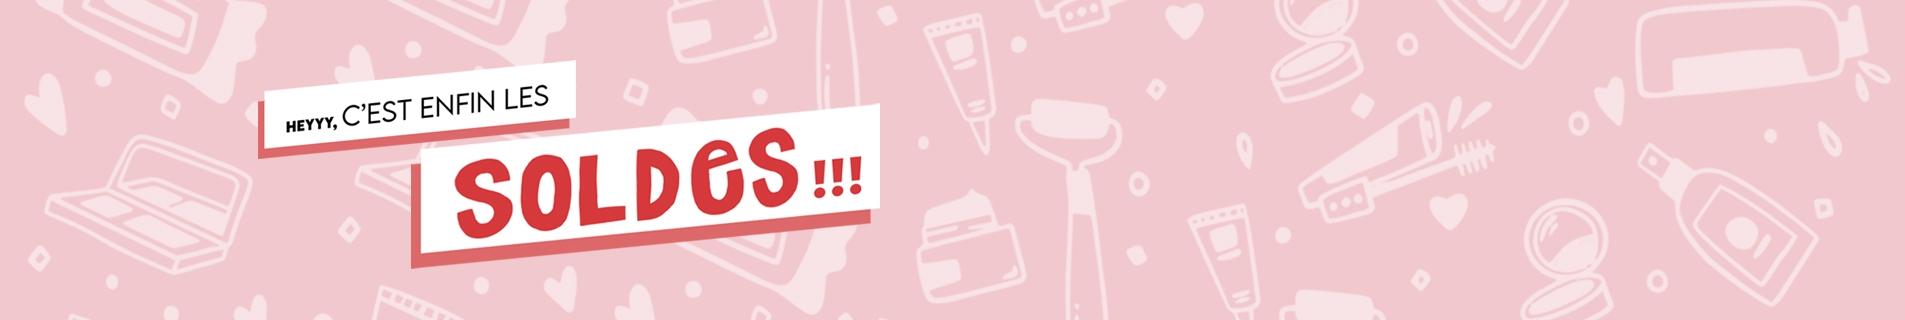 Soldes vernis à ongles | Site de maquillage | SAGA Cosmetics